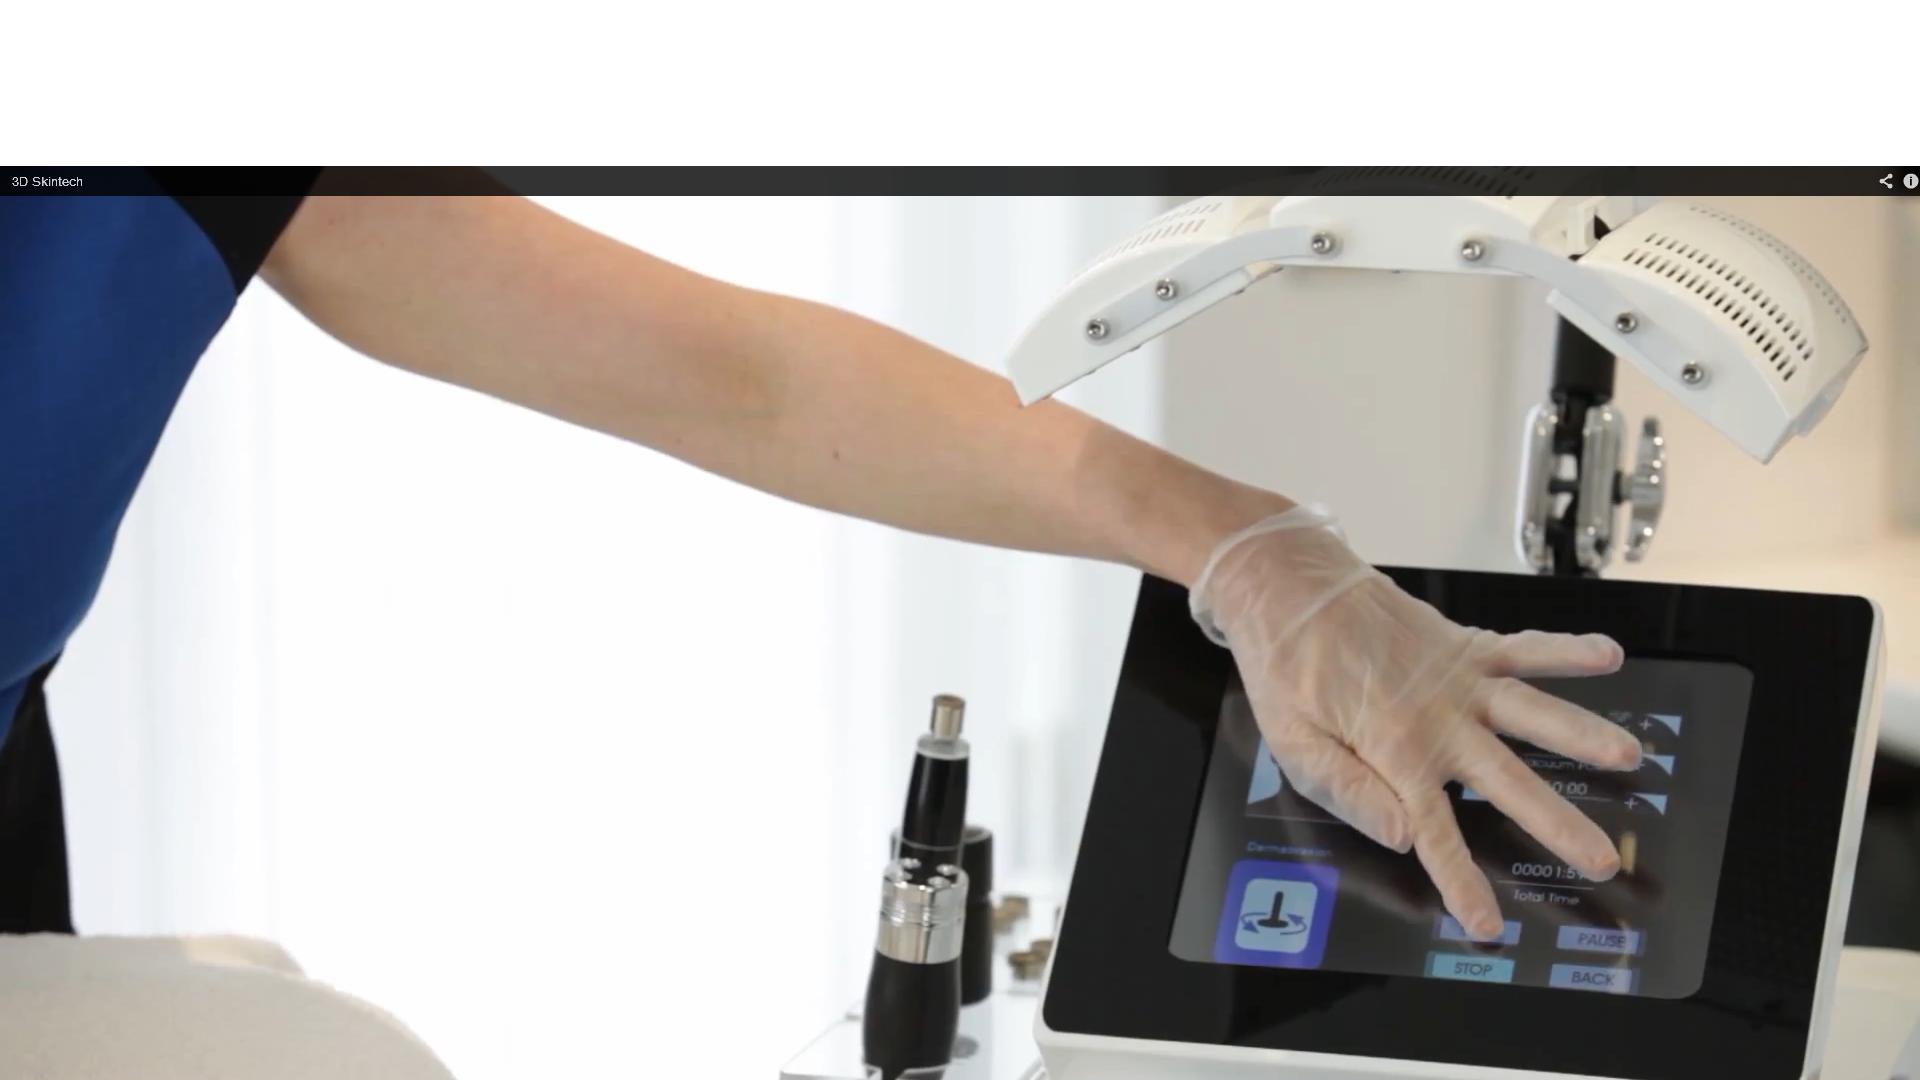 Rotational Diamond Peel Microdermabrasion technology uses